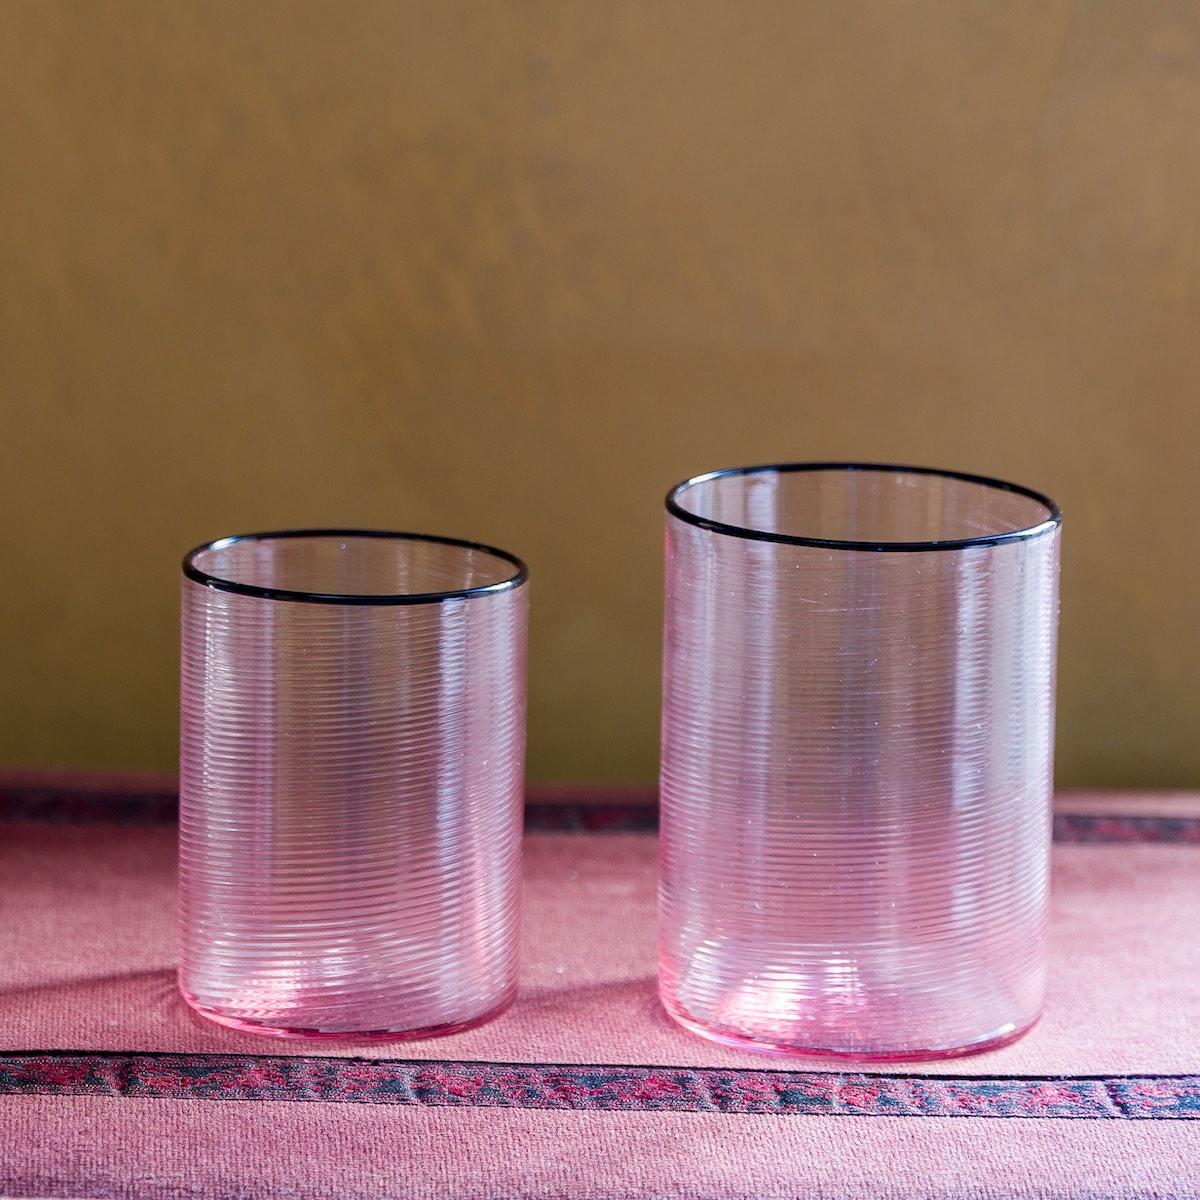 fizzy-pink-girly-glass-luxury-designer-sophisticated-water-wine-murano